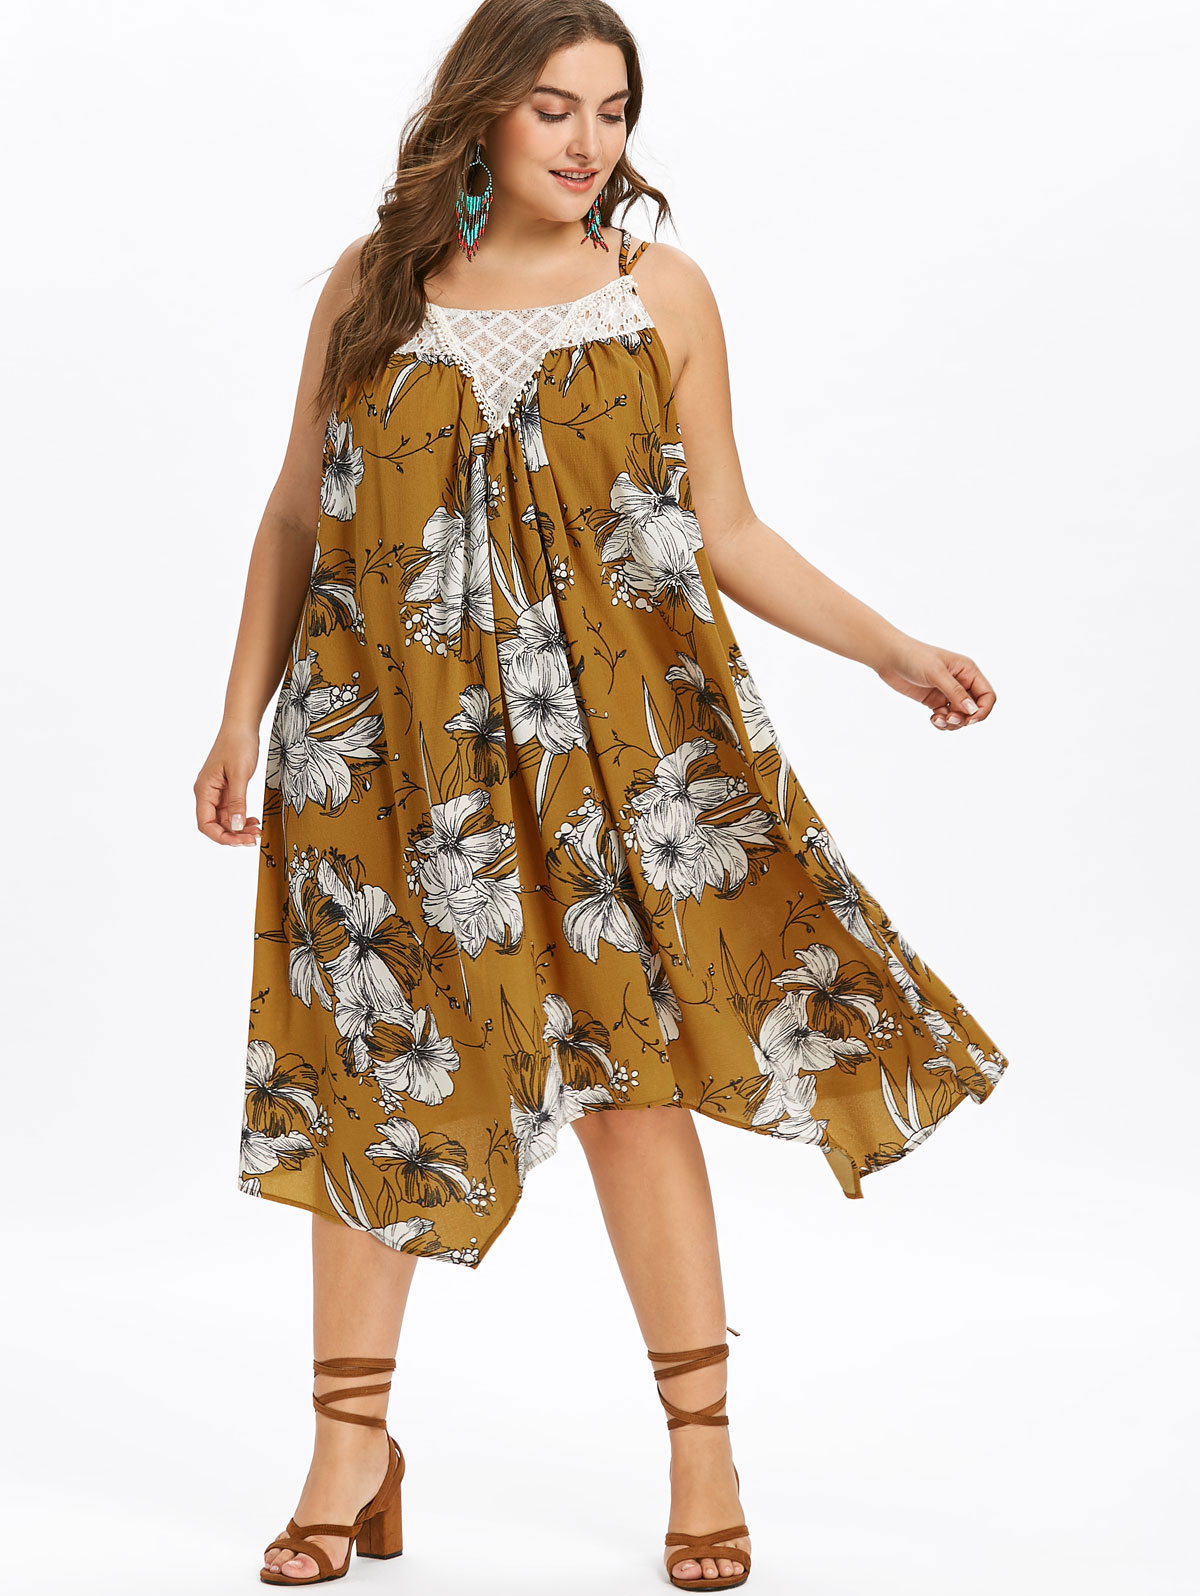 Gamiss Plus Size 5XL Floral Trapeze Lace Trim Dress Women Summer Spaghetti Strap Print Bohemia Casual Beach Sundress Vestidos